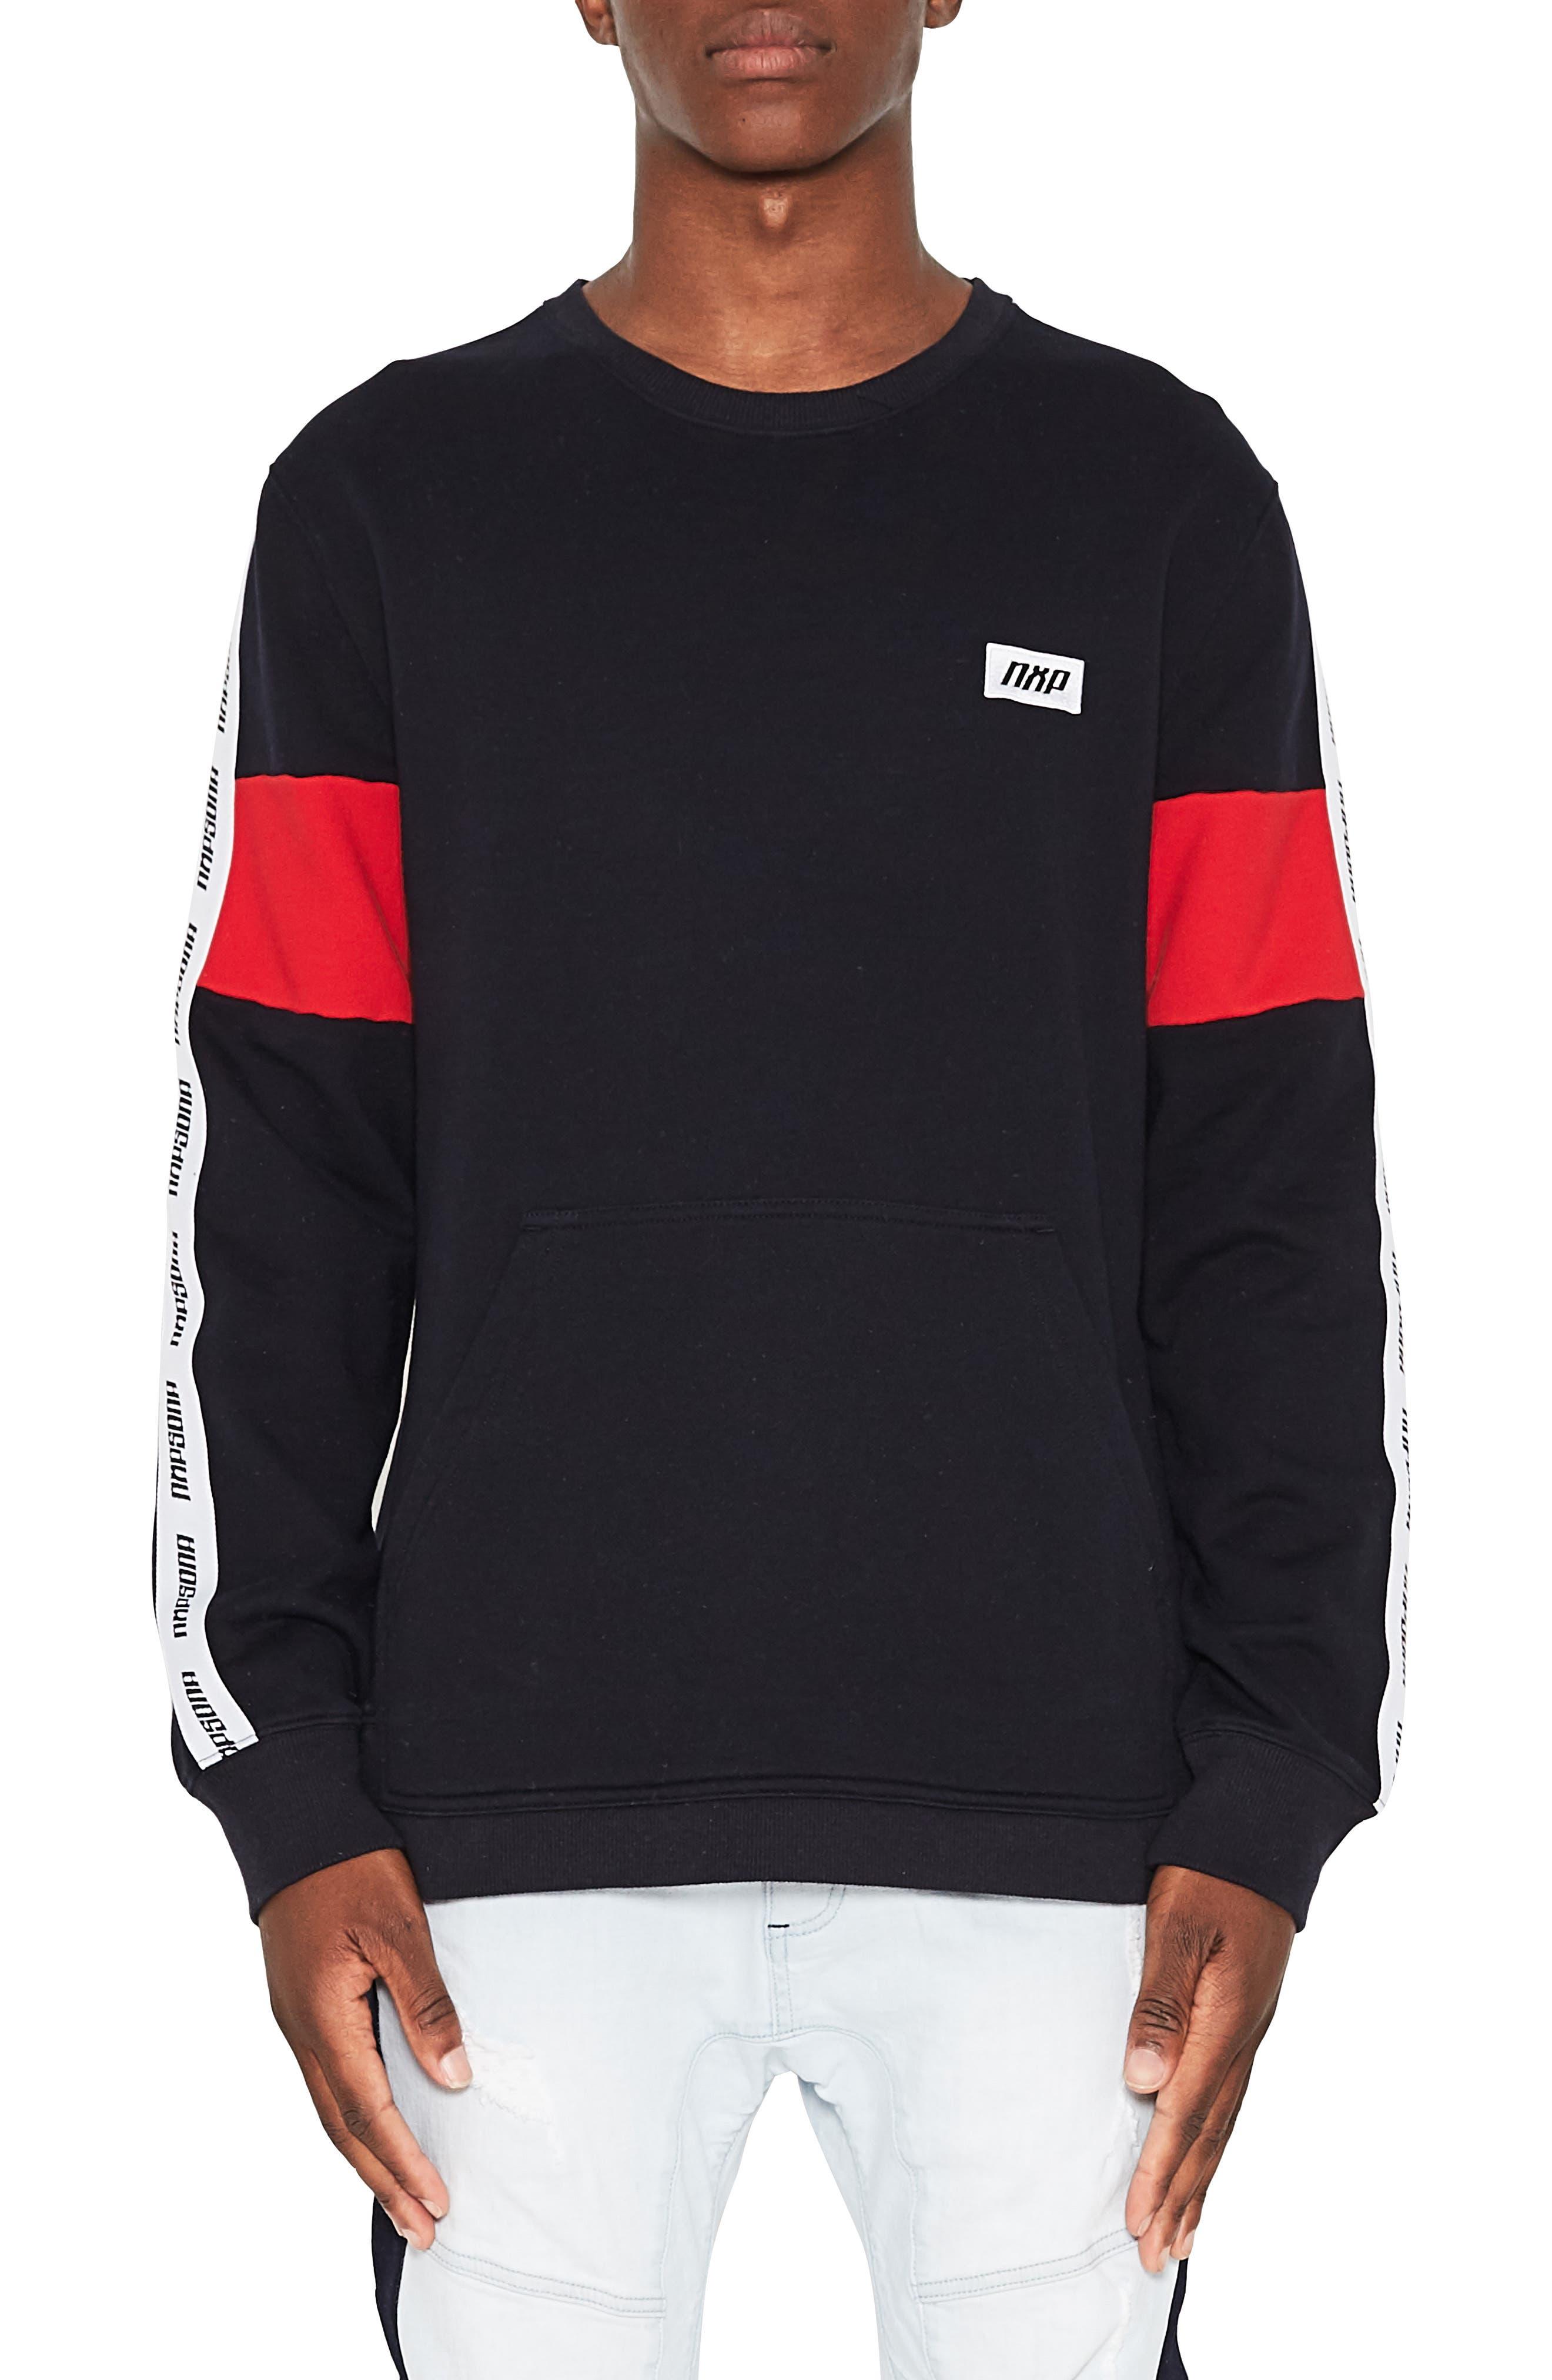 NXP Dragon Crewneck Sweatshirt in Graphite